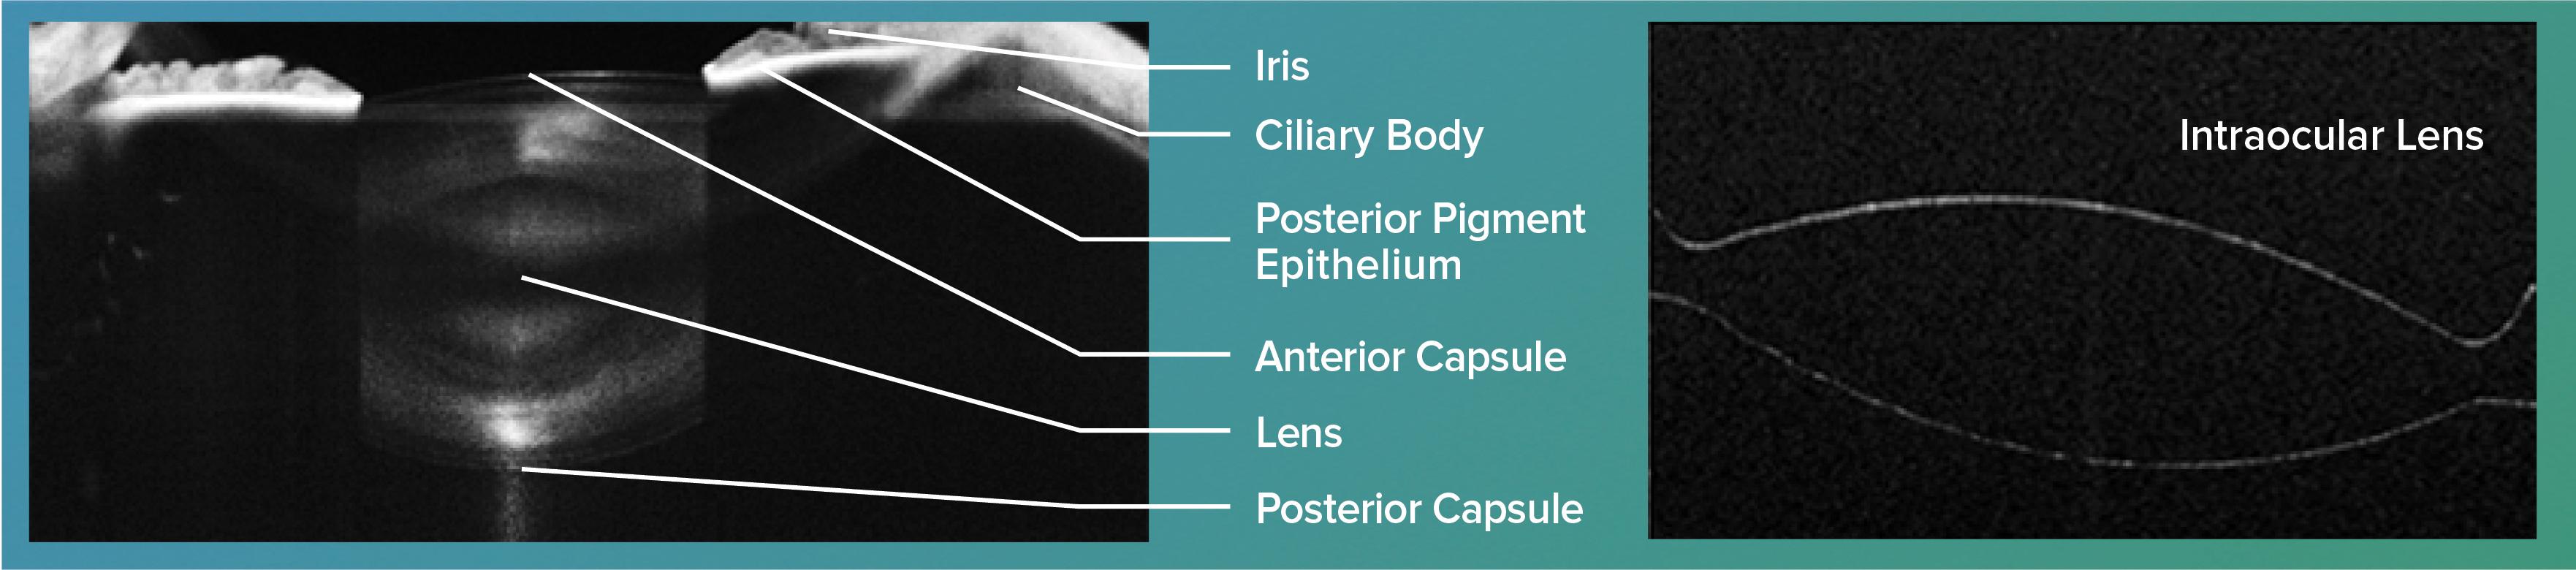 crystalline lens OCT images